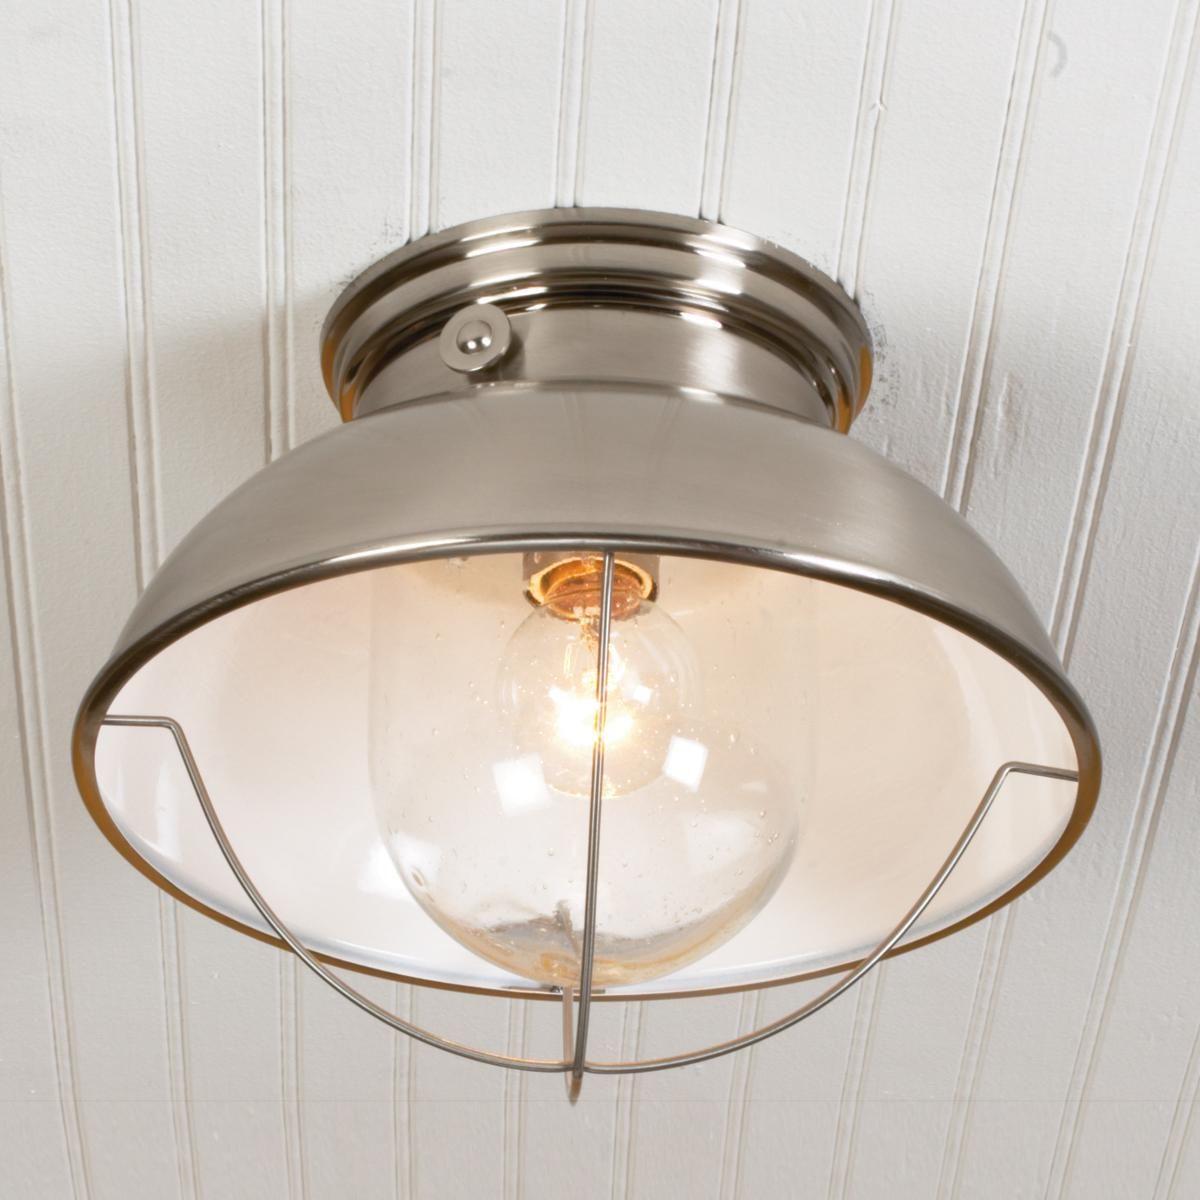 Nantucket Ceiling Light